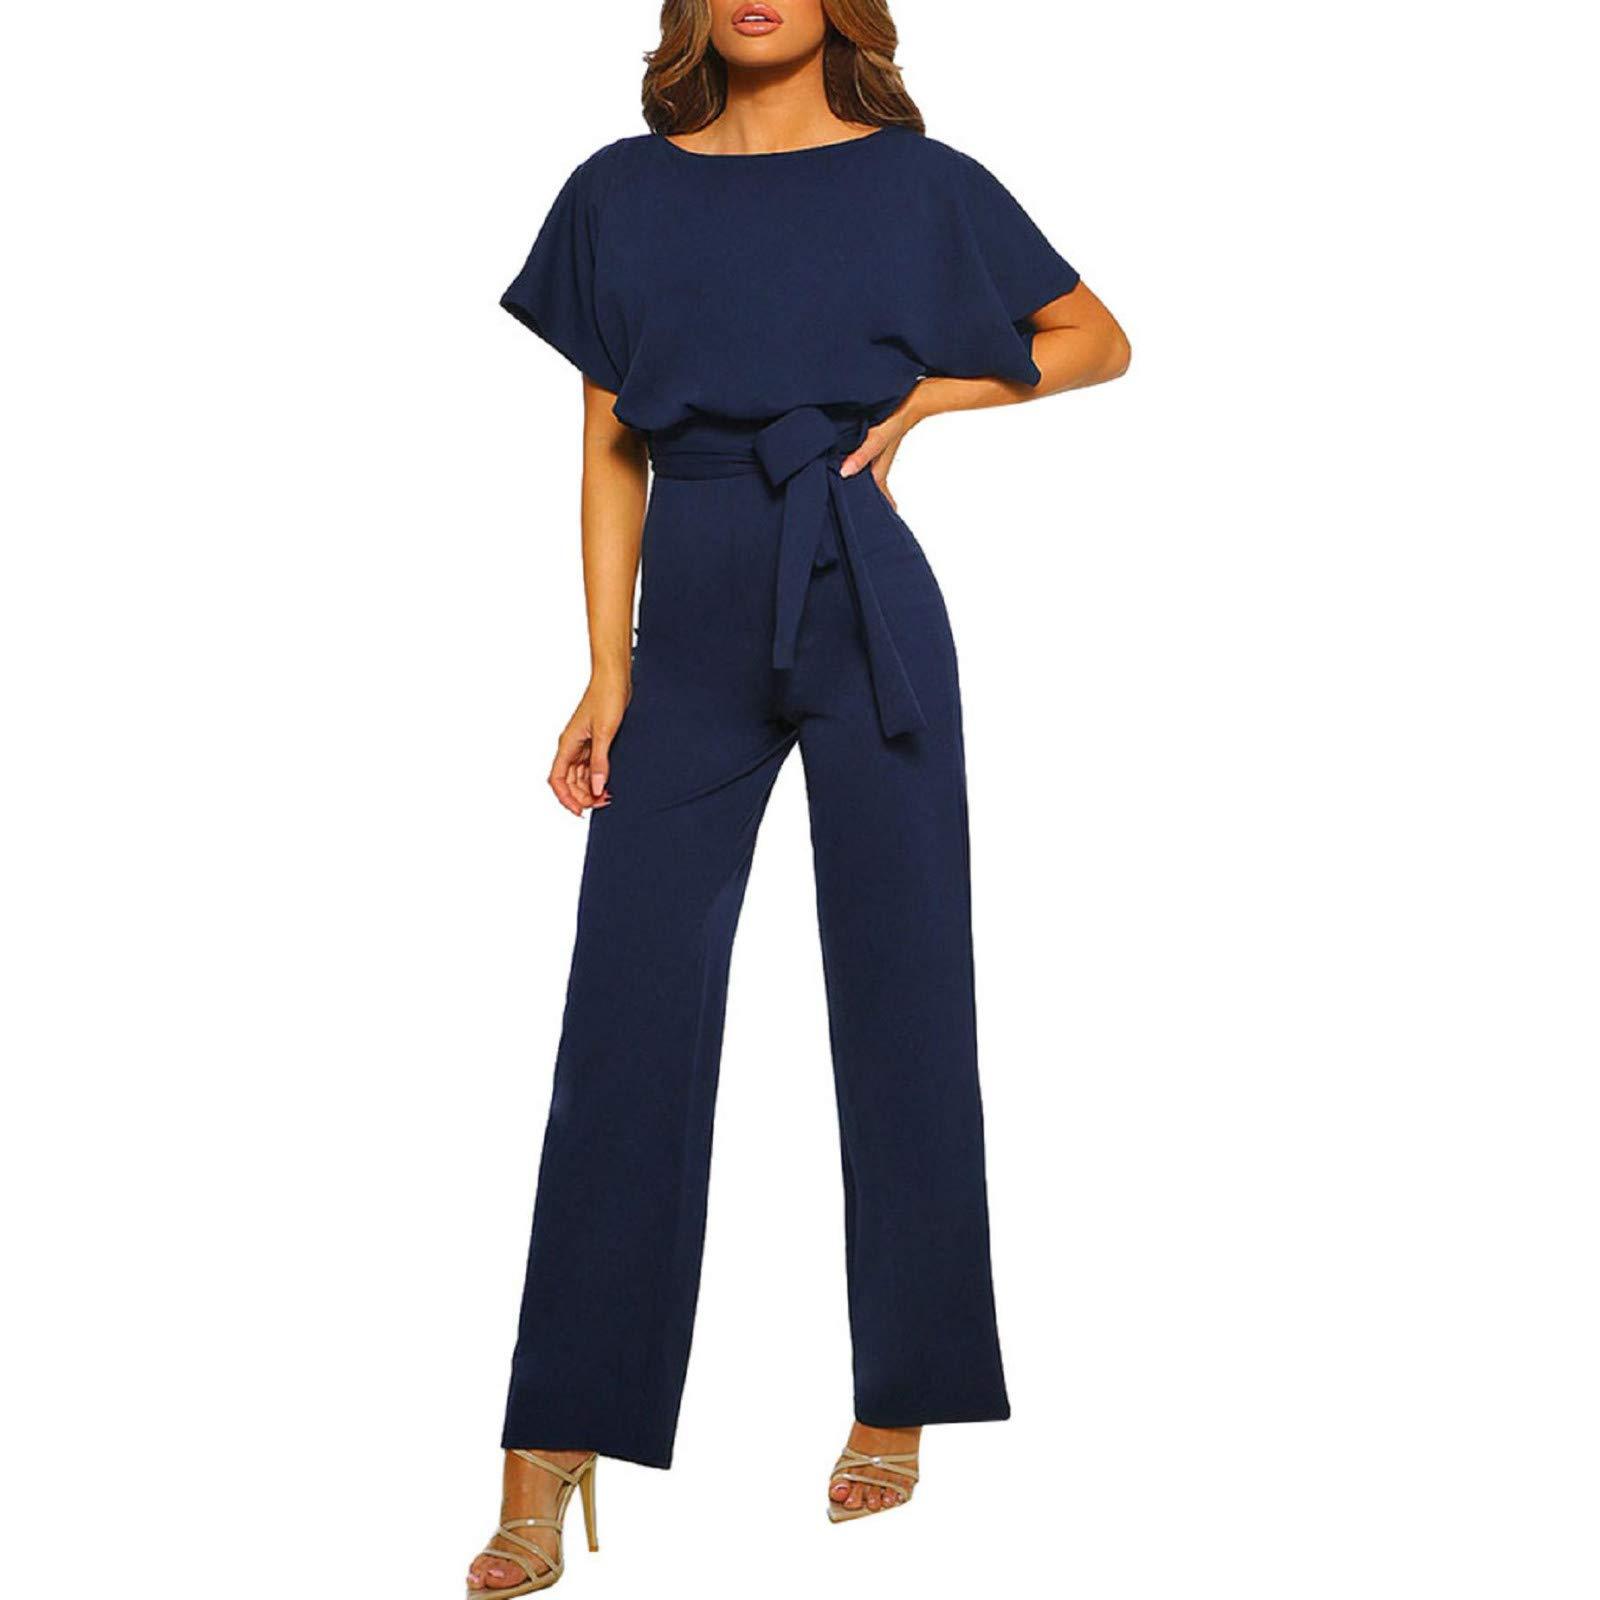 Women Short Sleeve Jumpsuit,Summer Women Short Sleeve Playsuit Club Wear Straight Leg Jumpsuit with Belt Navy